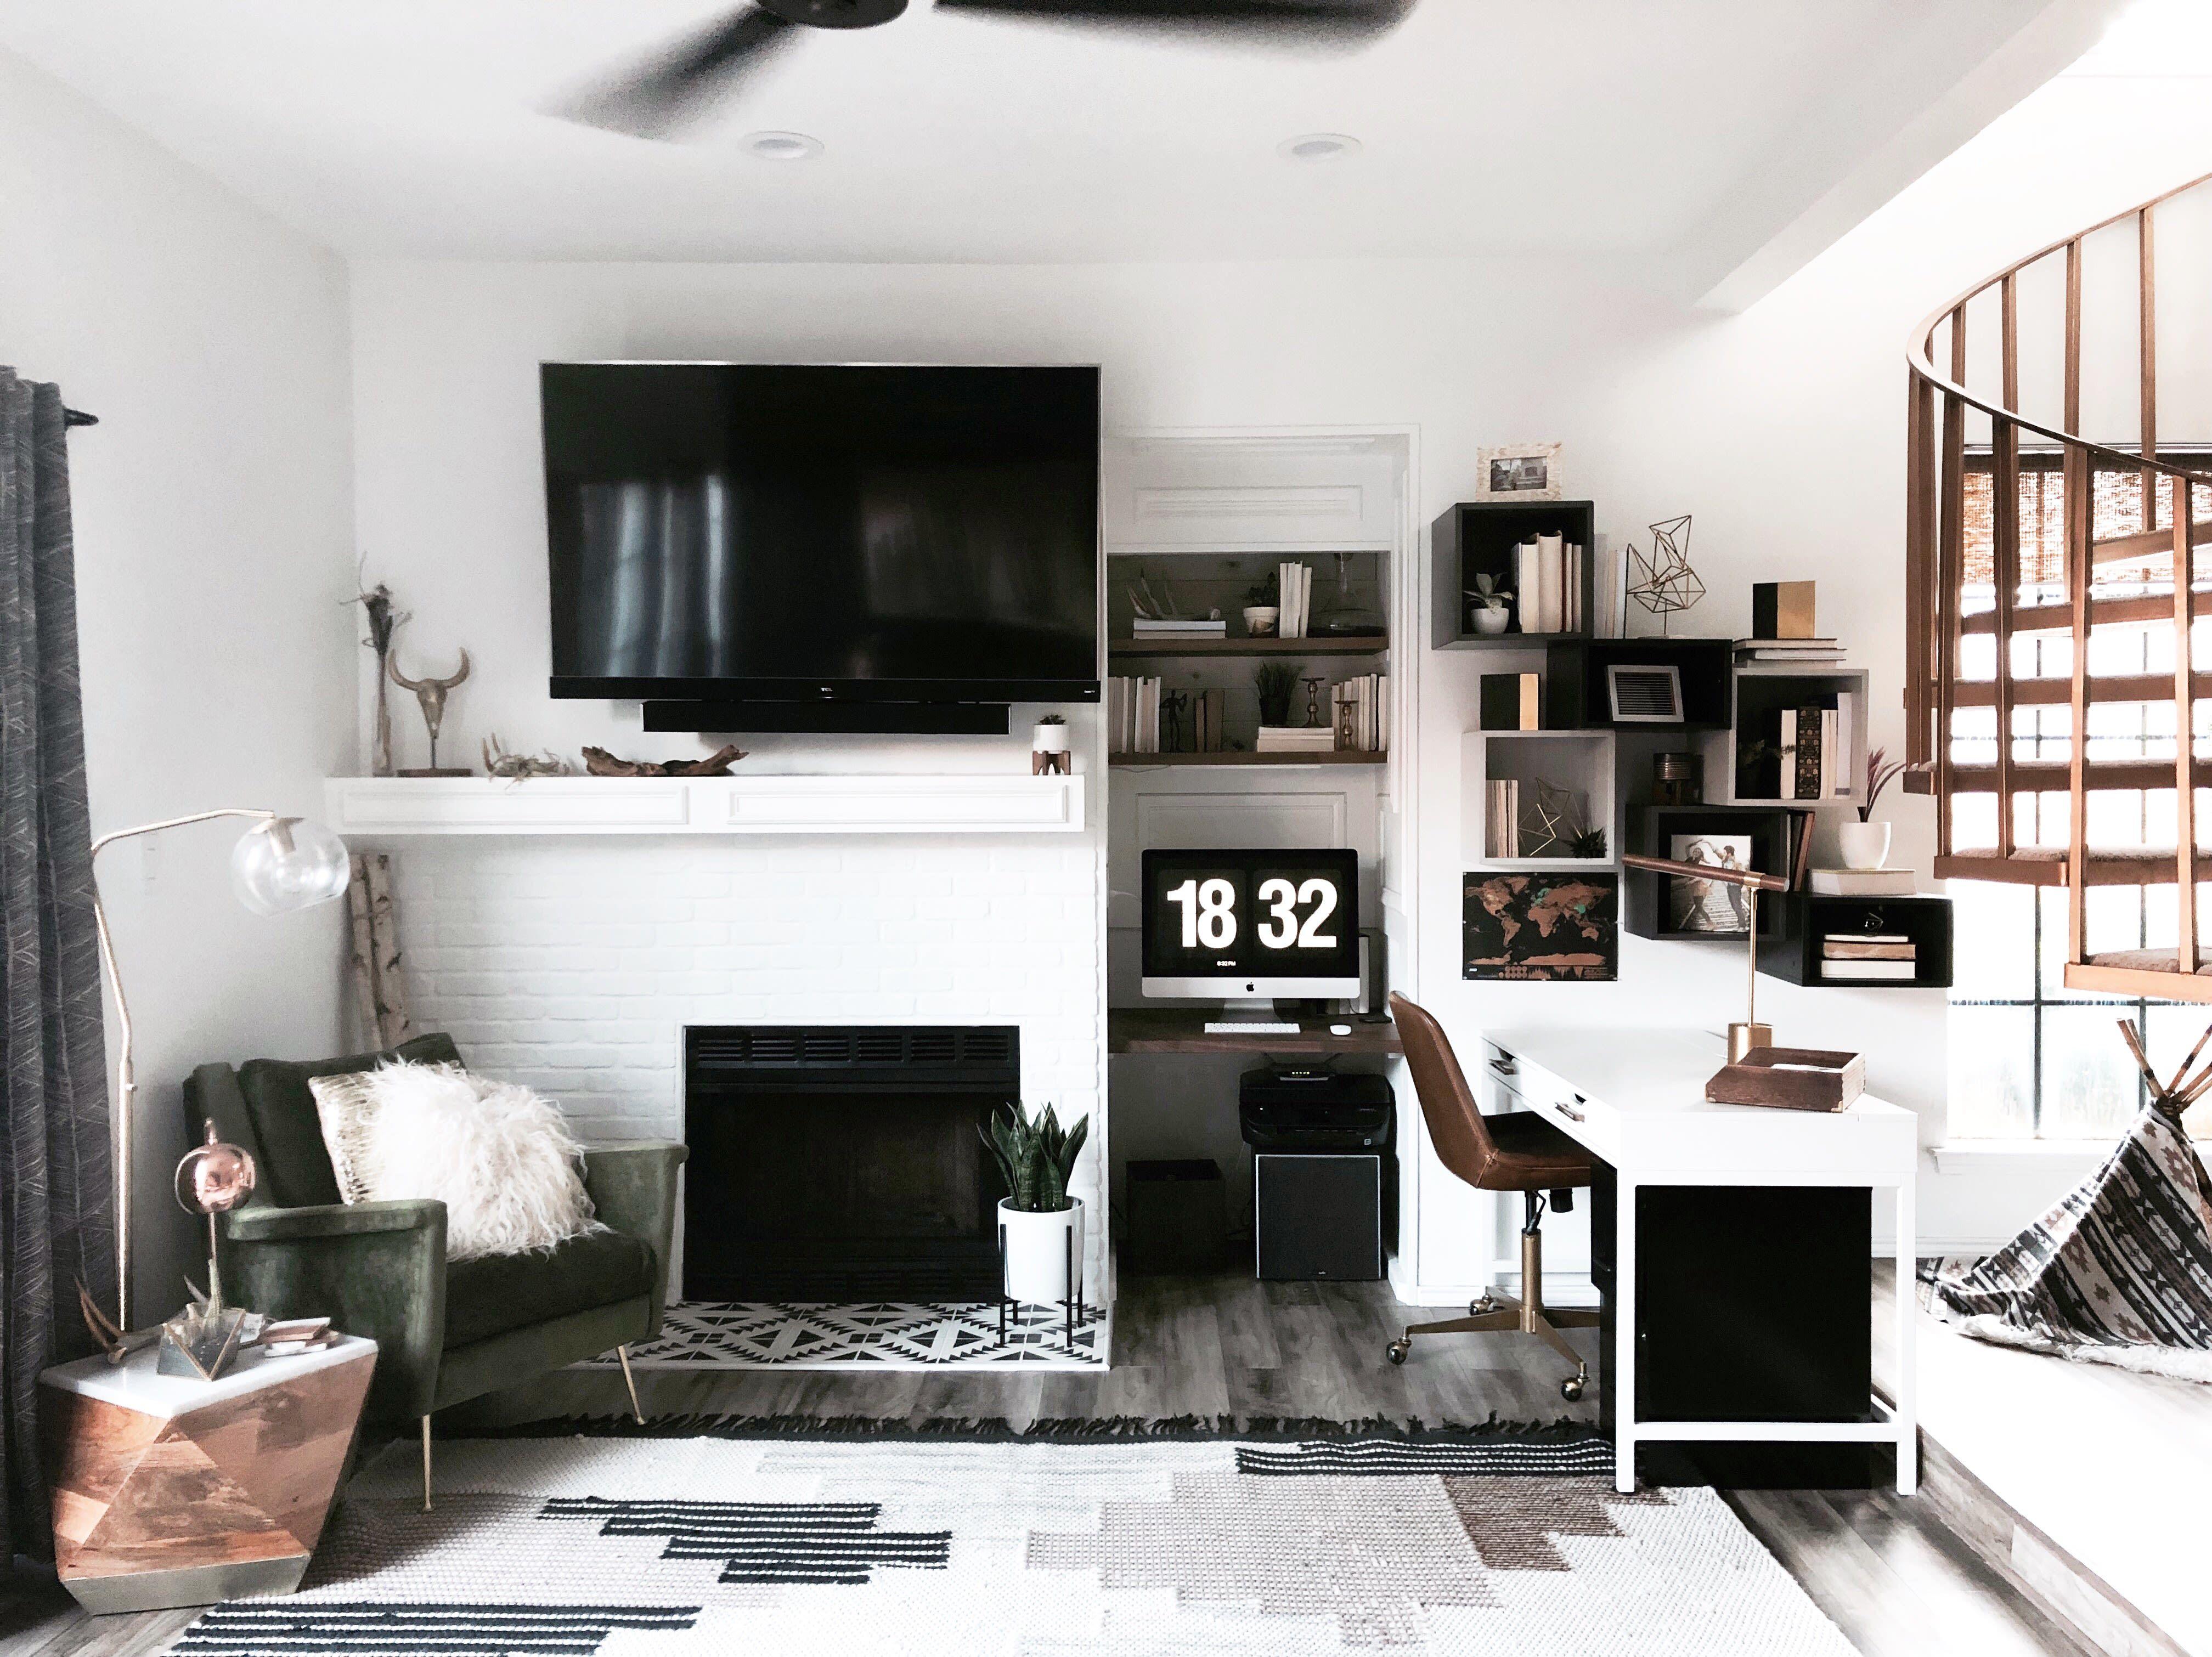 Can You Get An Apartment At 18 In Texas Scandinavian Minimalism Meets Organic Bohemian In Texas With Images Boho Remodel Scandinavian Minimalism House Interior